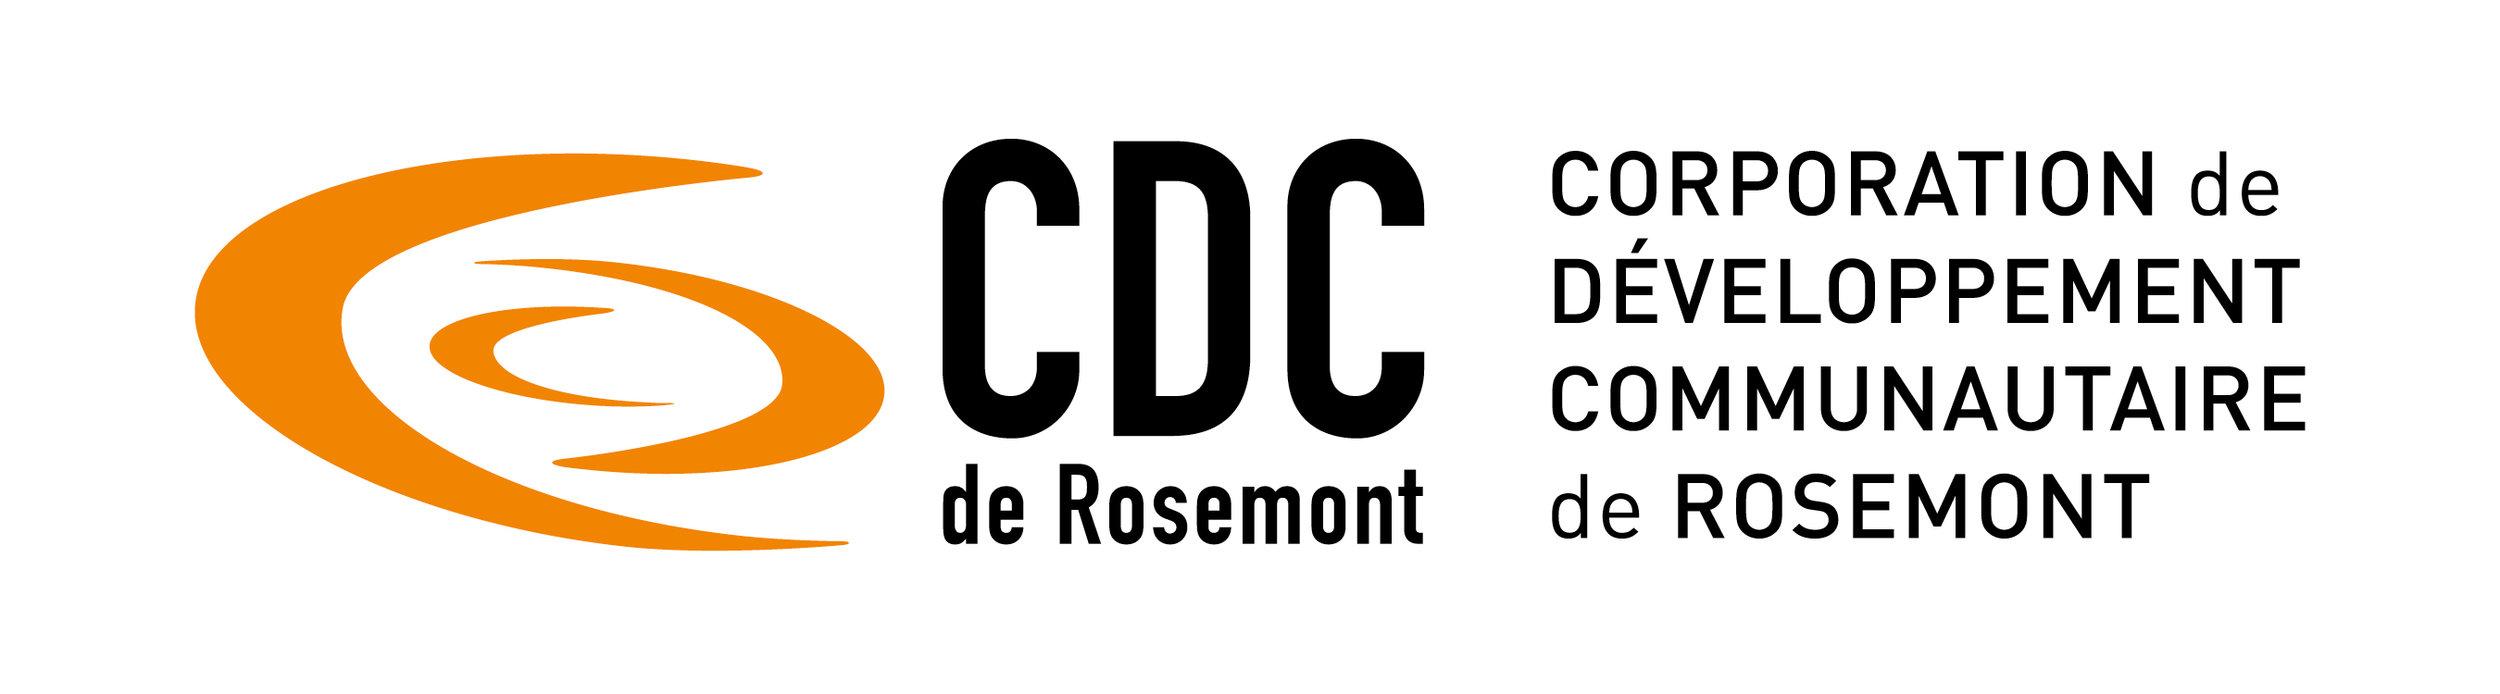 Logo-cdc-plus-collé.jpg